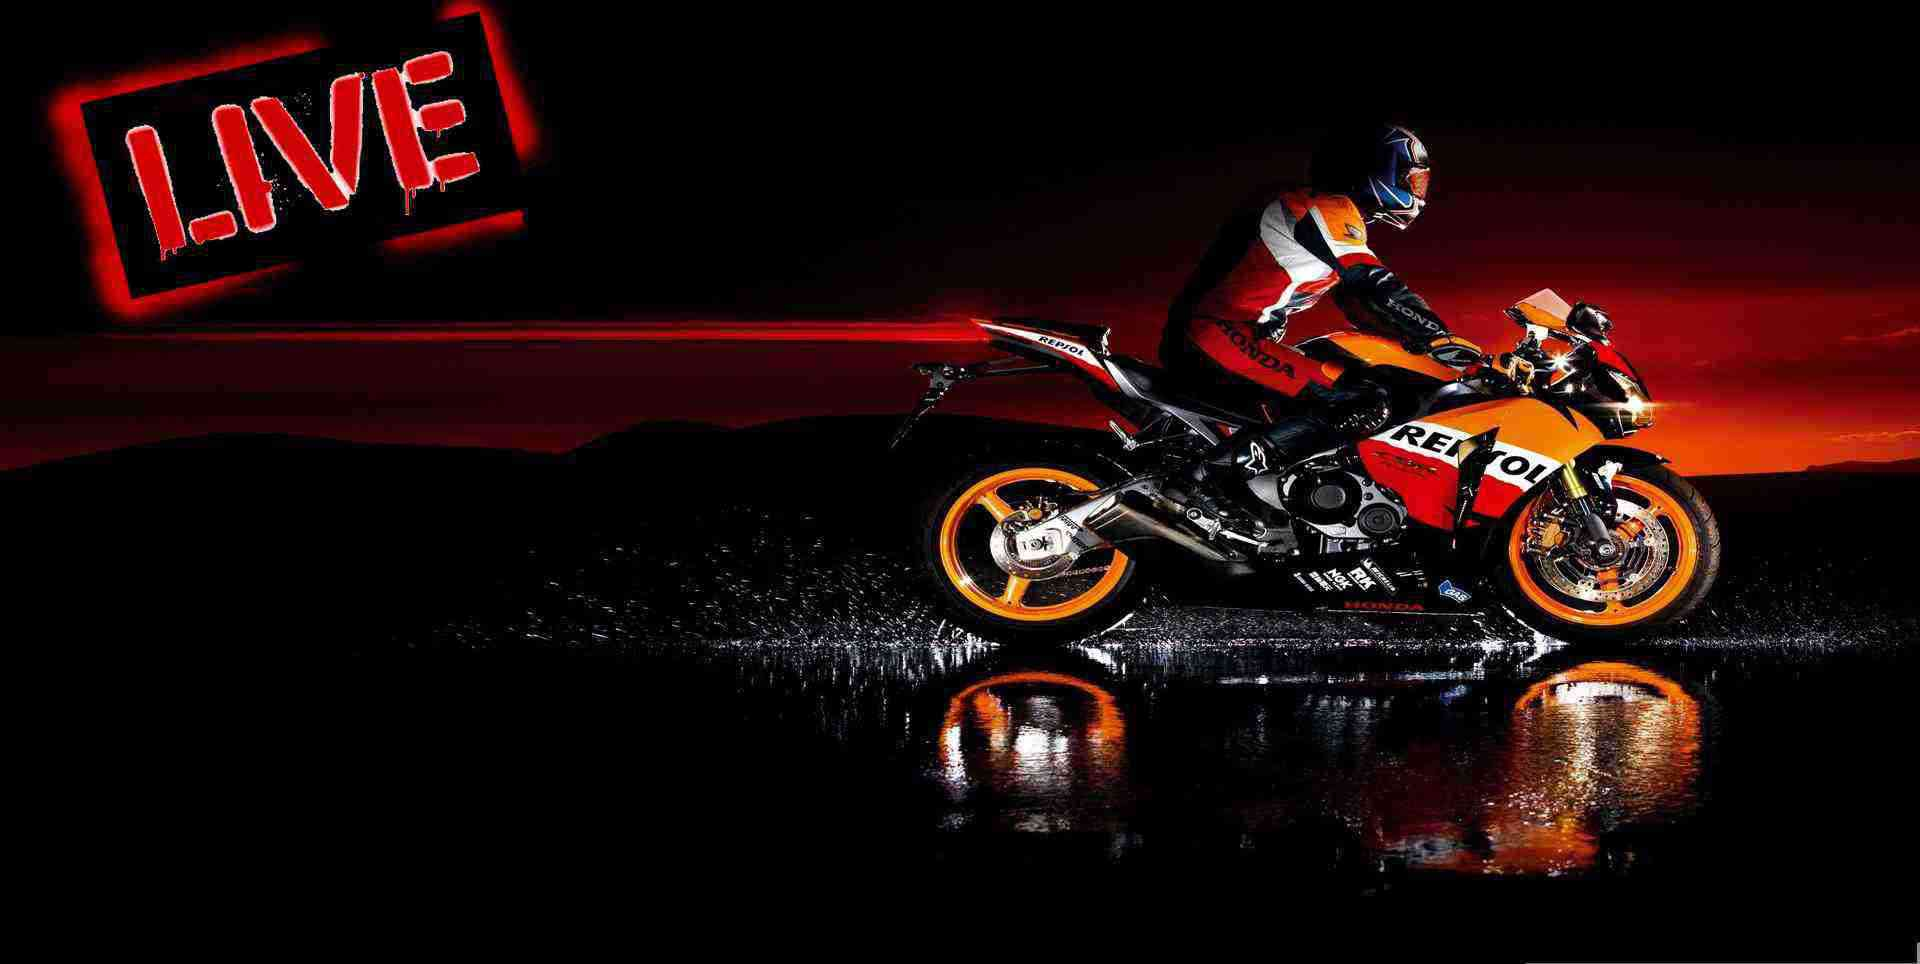 Watch 2014 French MotoGP Grand Prix Live